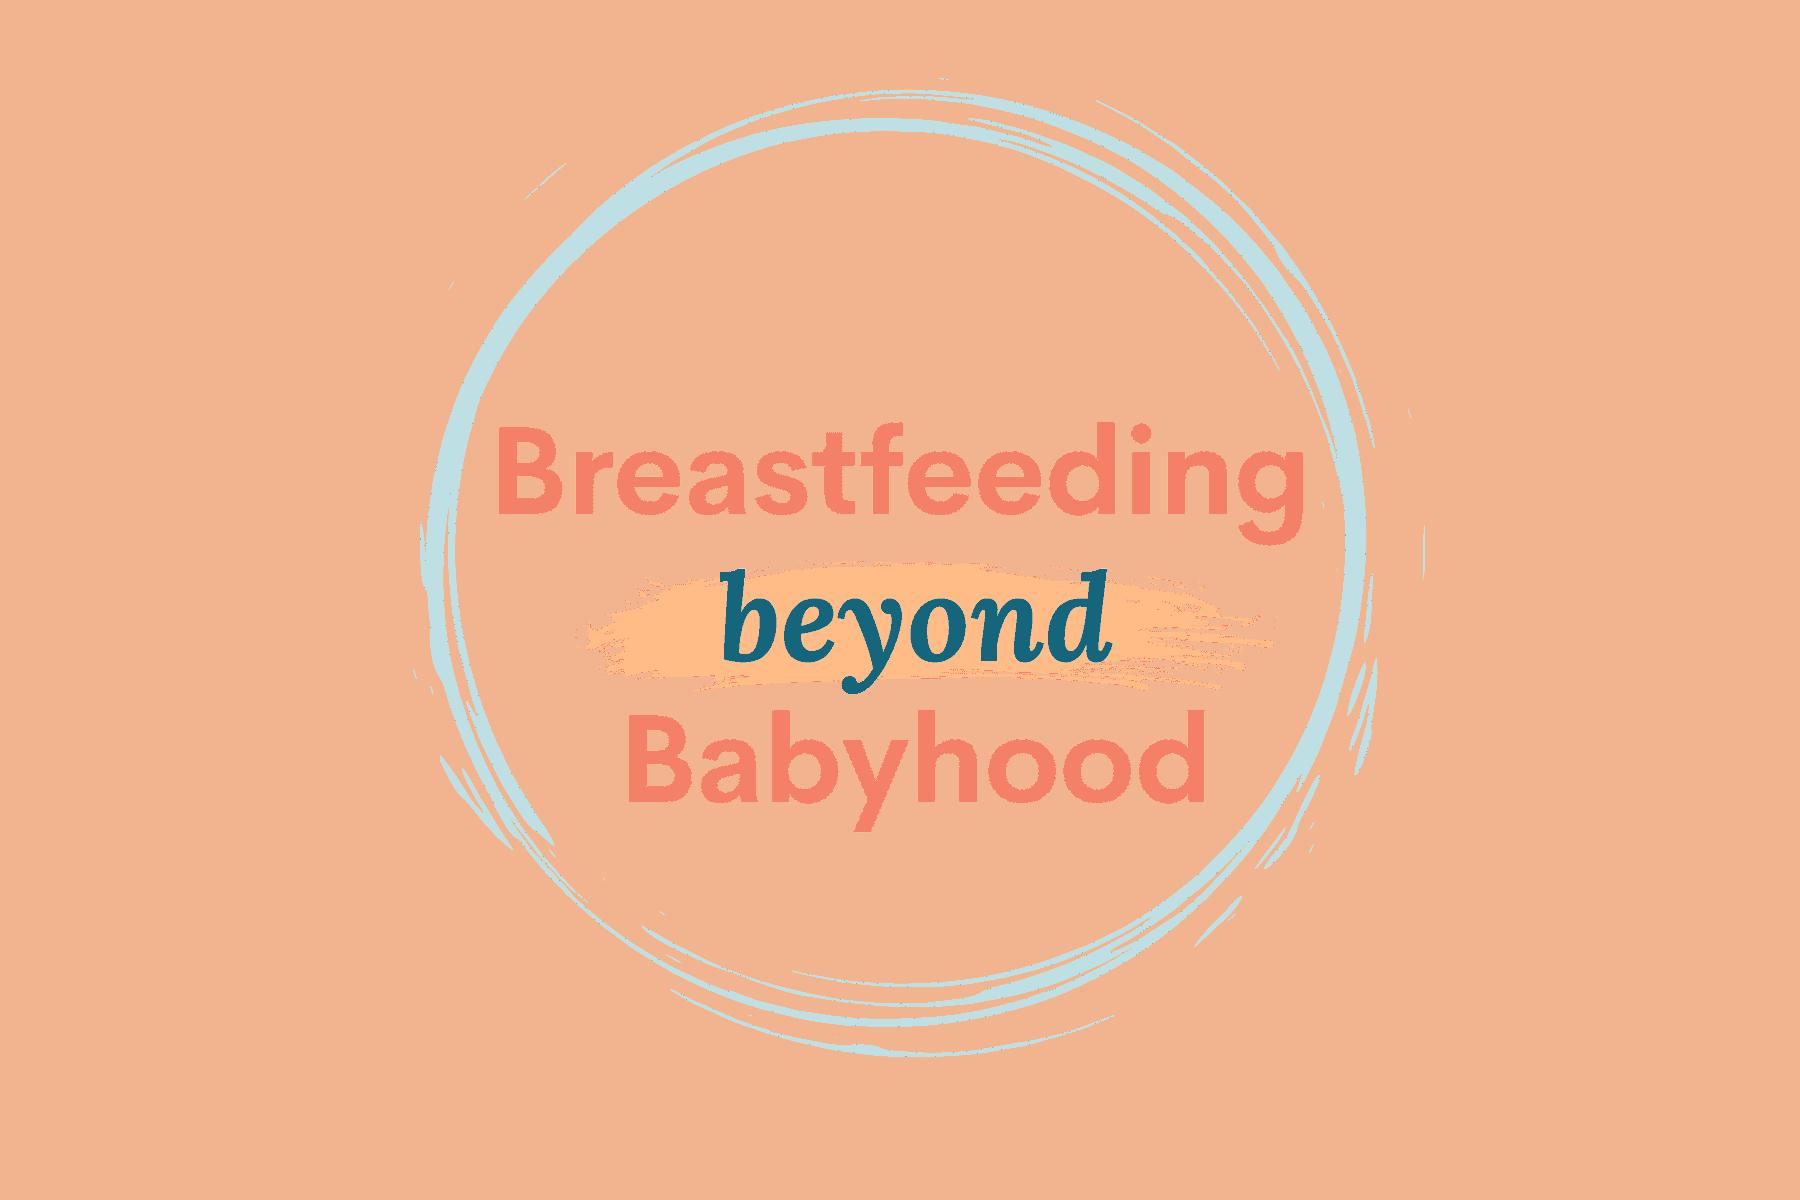 Breastfeeding Beyond Babyhood